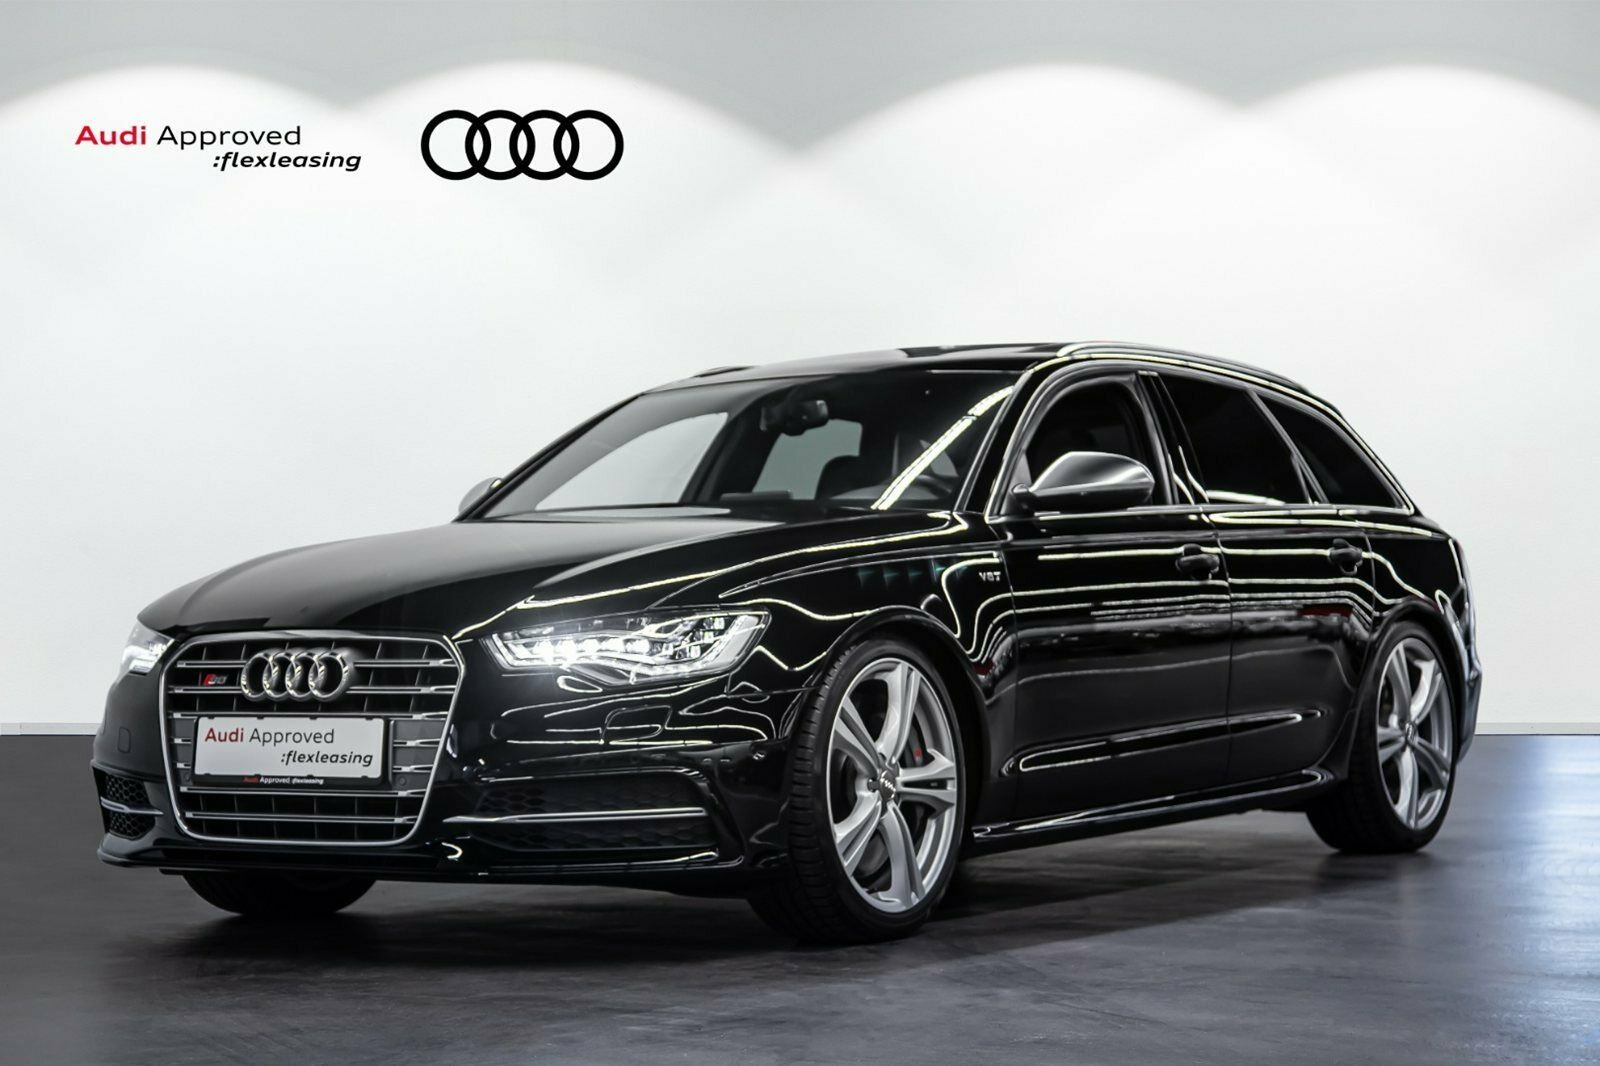 Audi S6 4,0 TFSi Avant quattro S-tr. 5d - 4.489 kr.